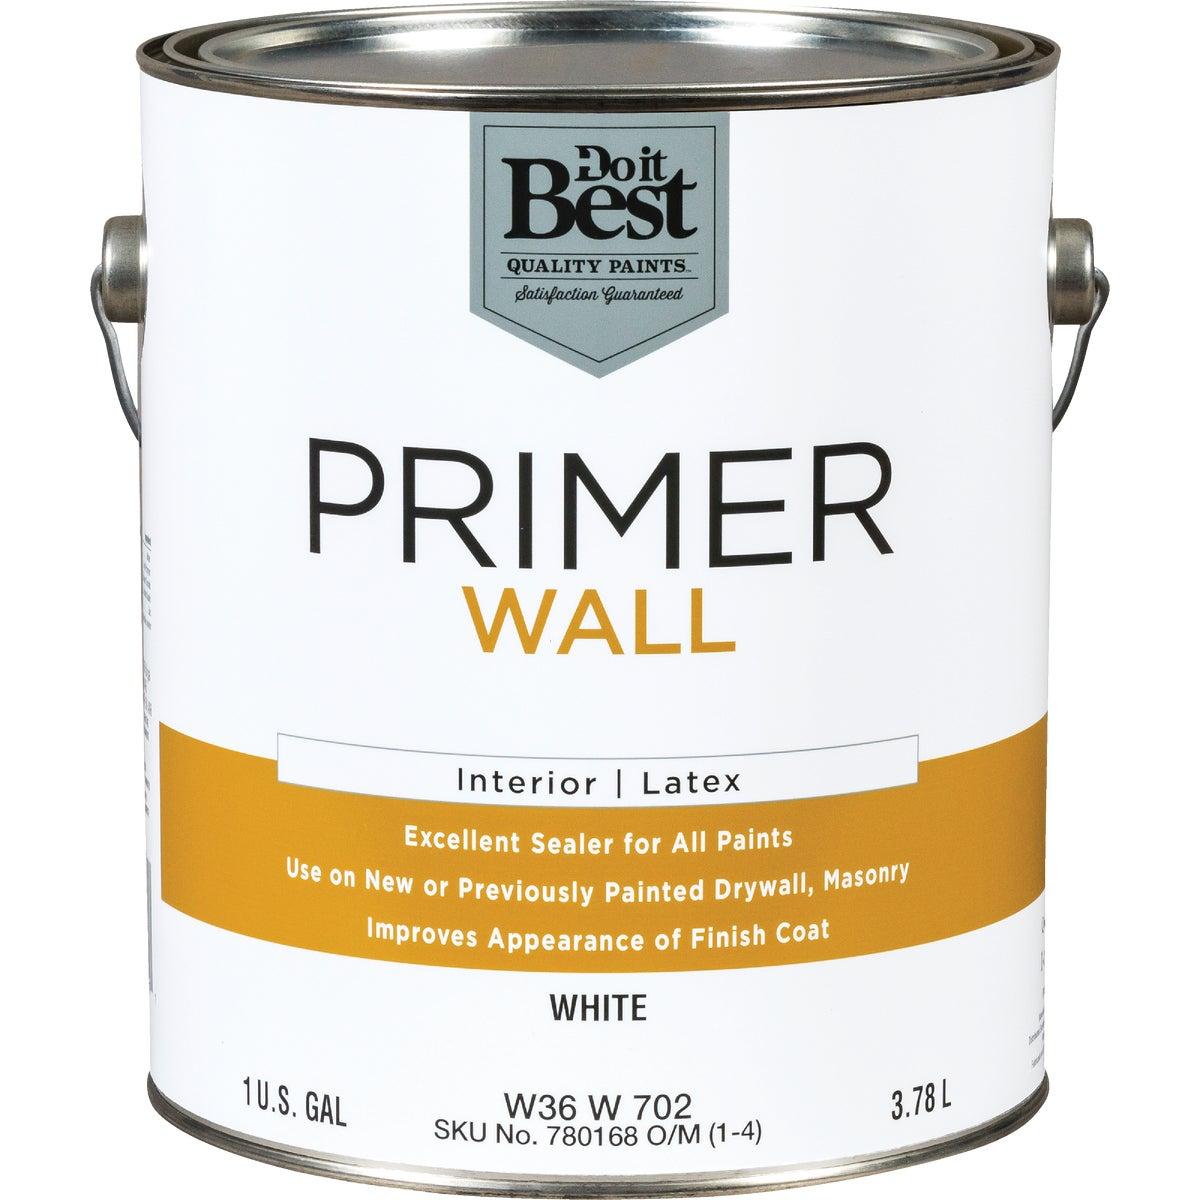 INT LATEX WALL PRIMER